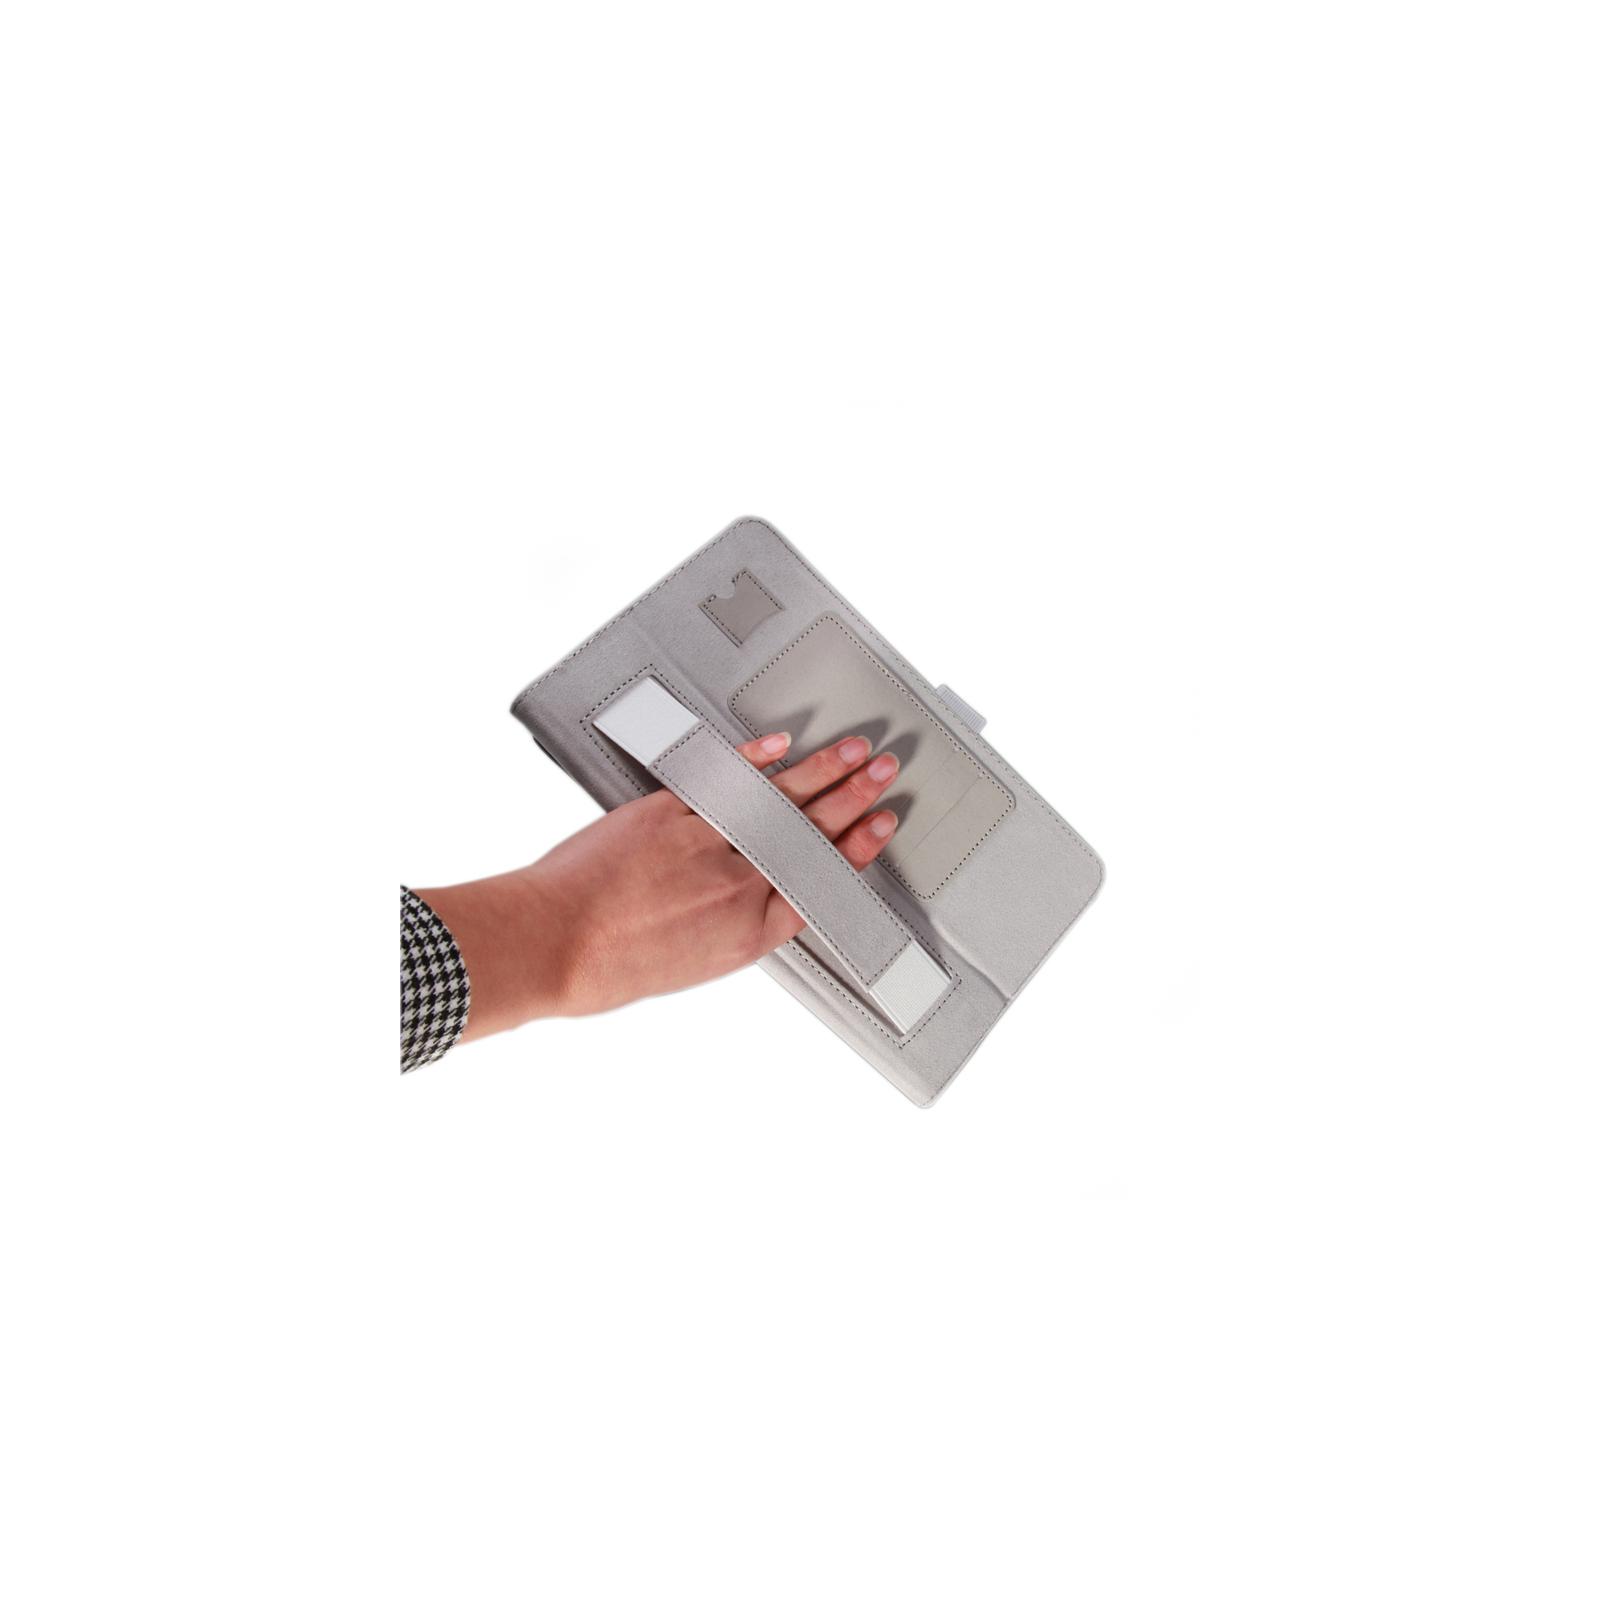 Чехол для планшета AirOn для LG G Pad 8.3 white (6946795850113) изображение 6